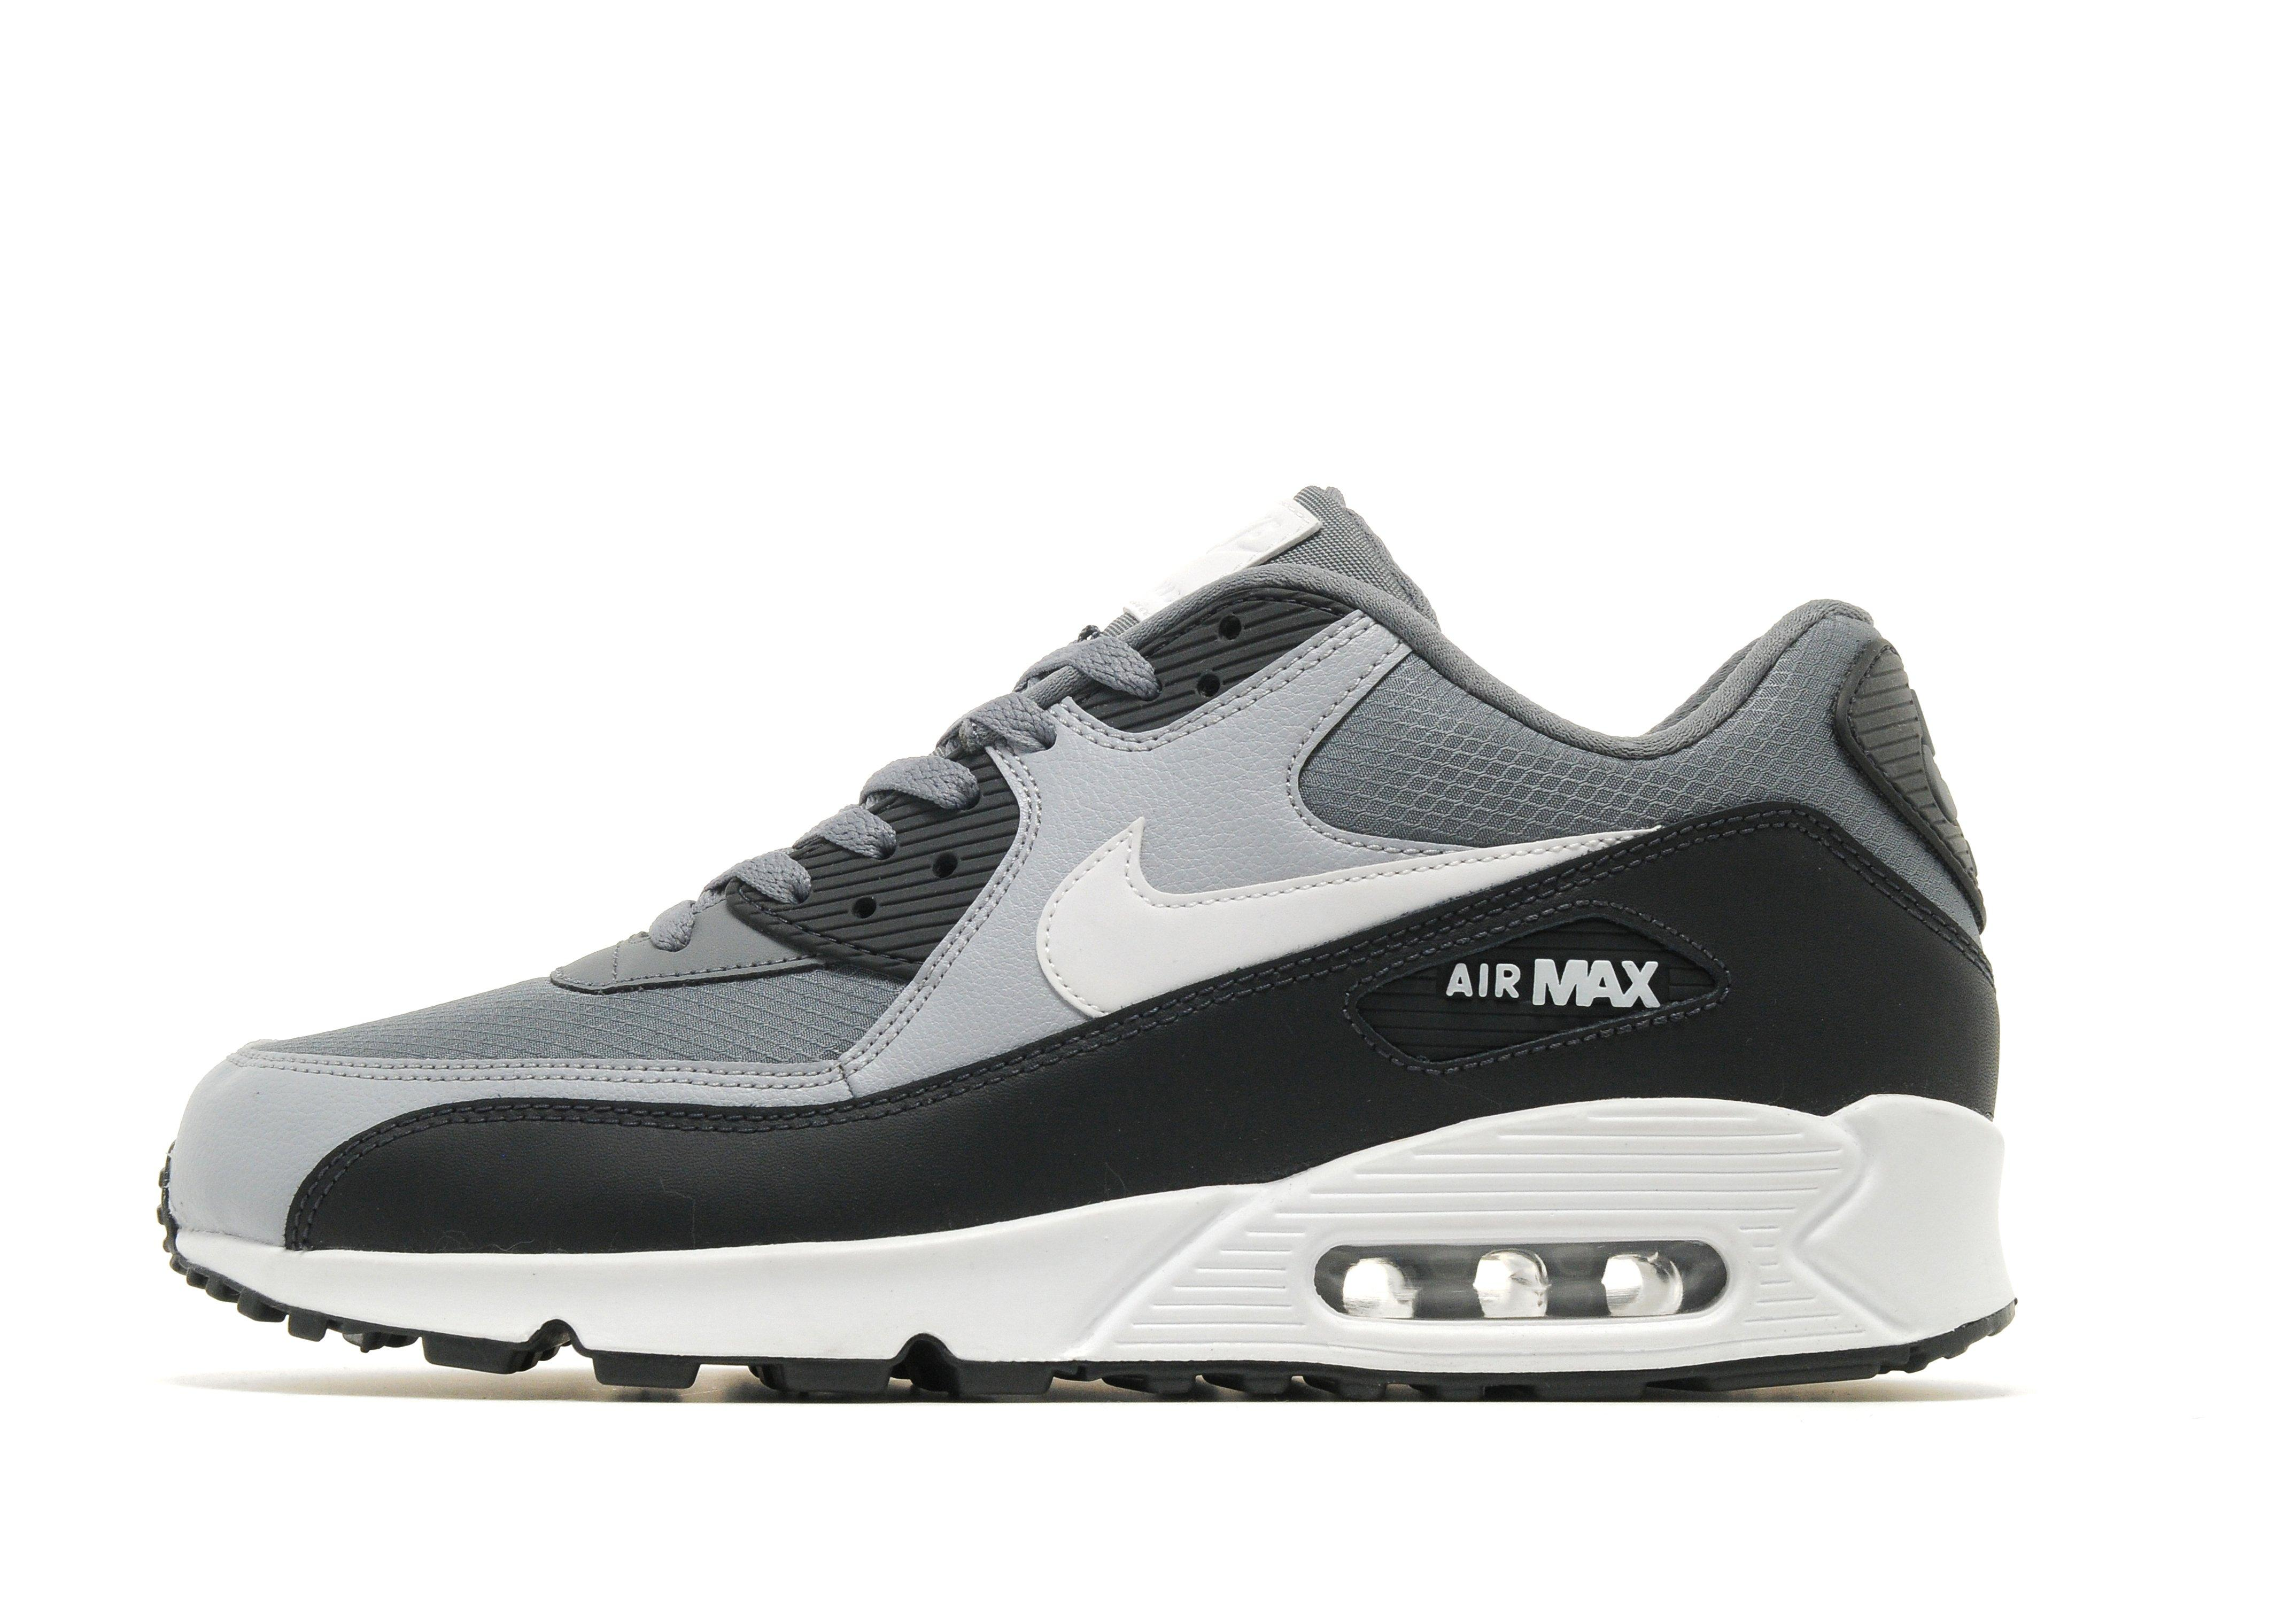 Nike Air Max 90 Formateurs Académie Essentiels